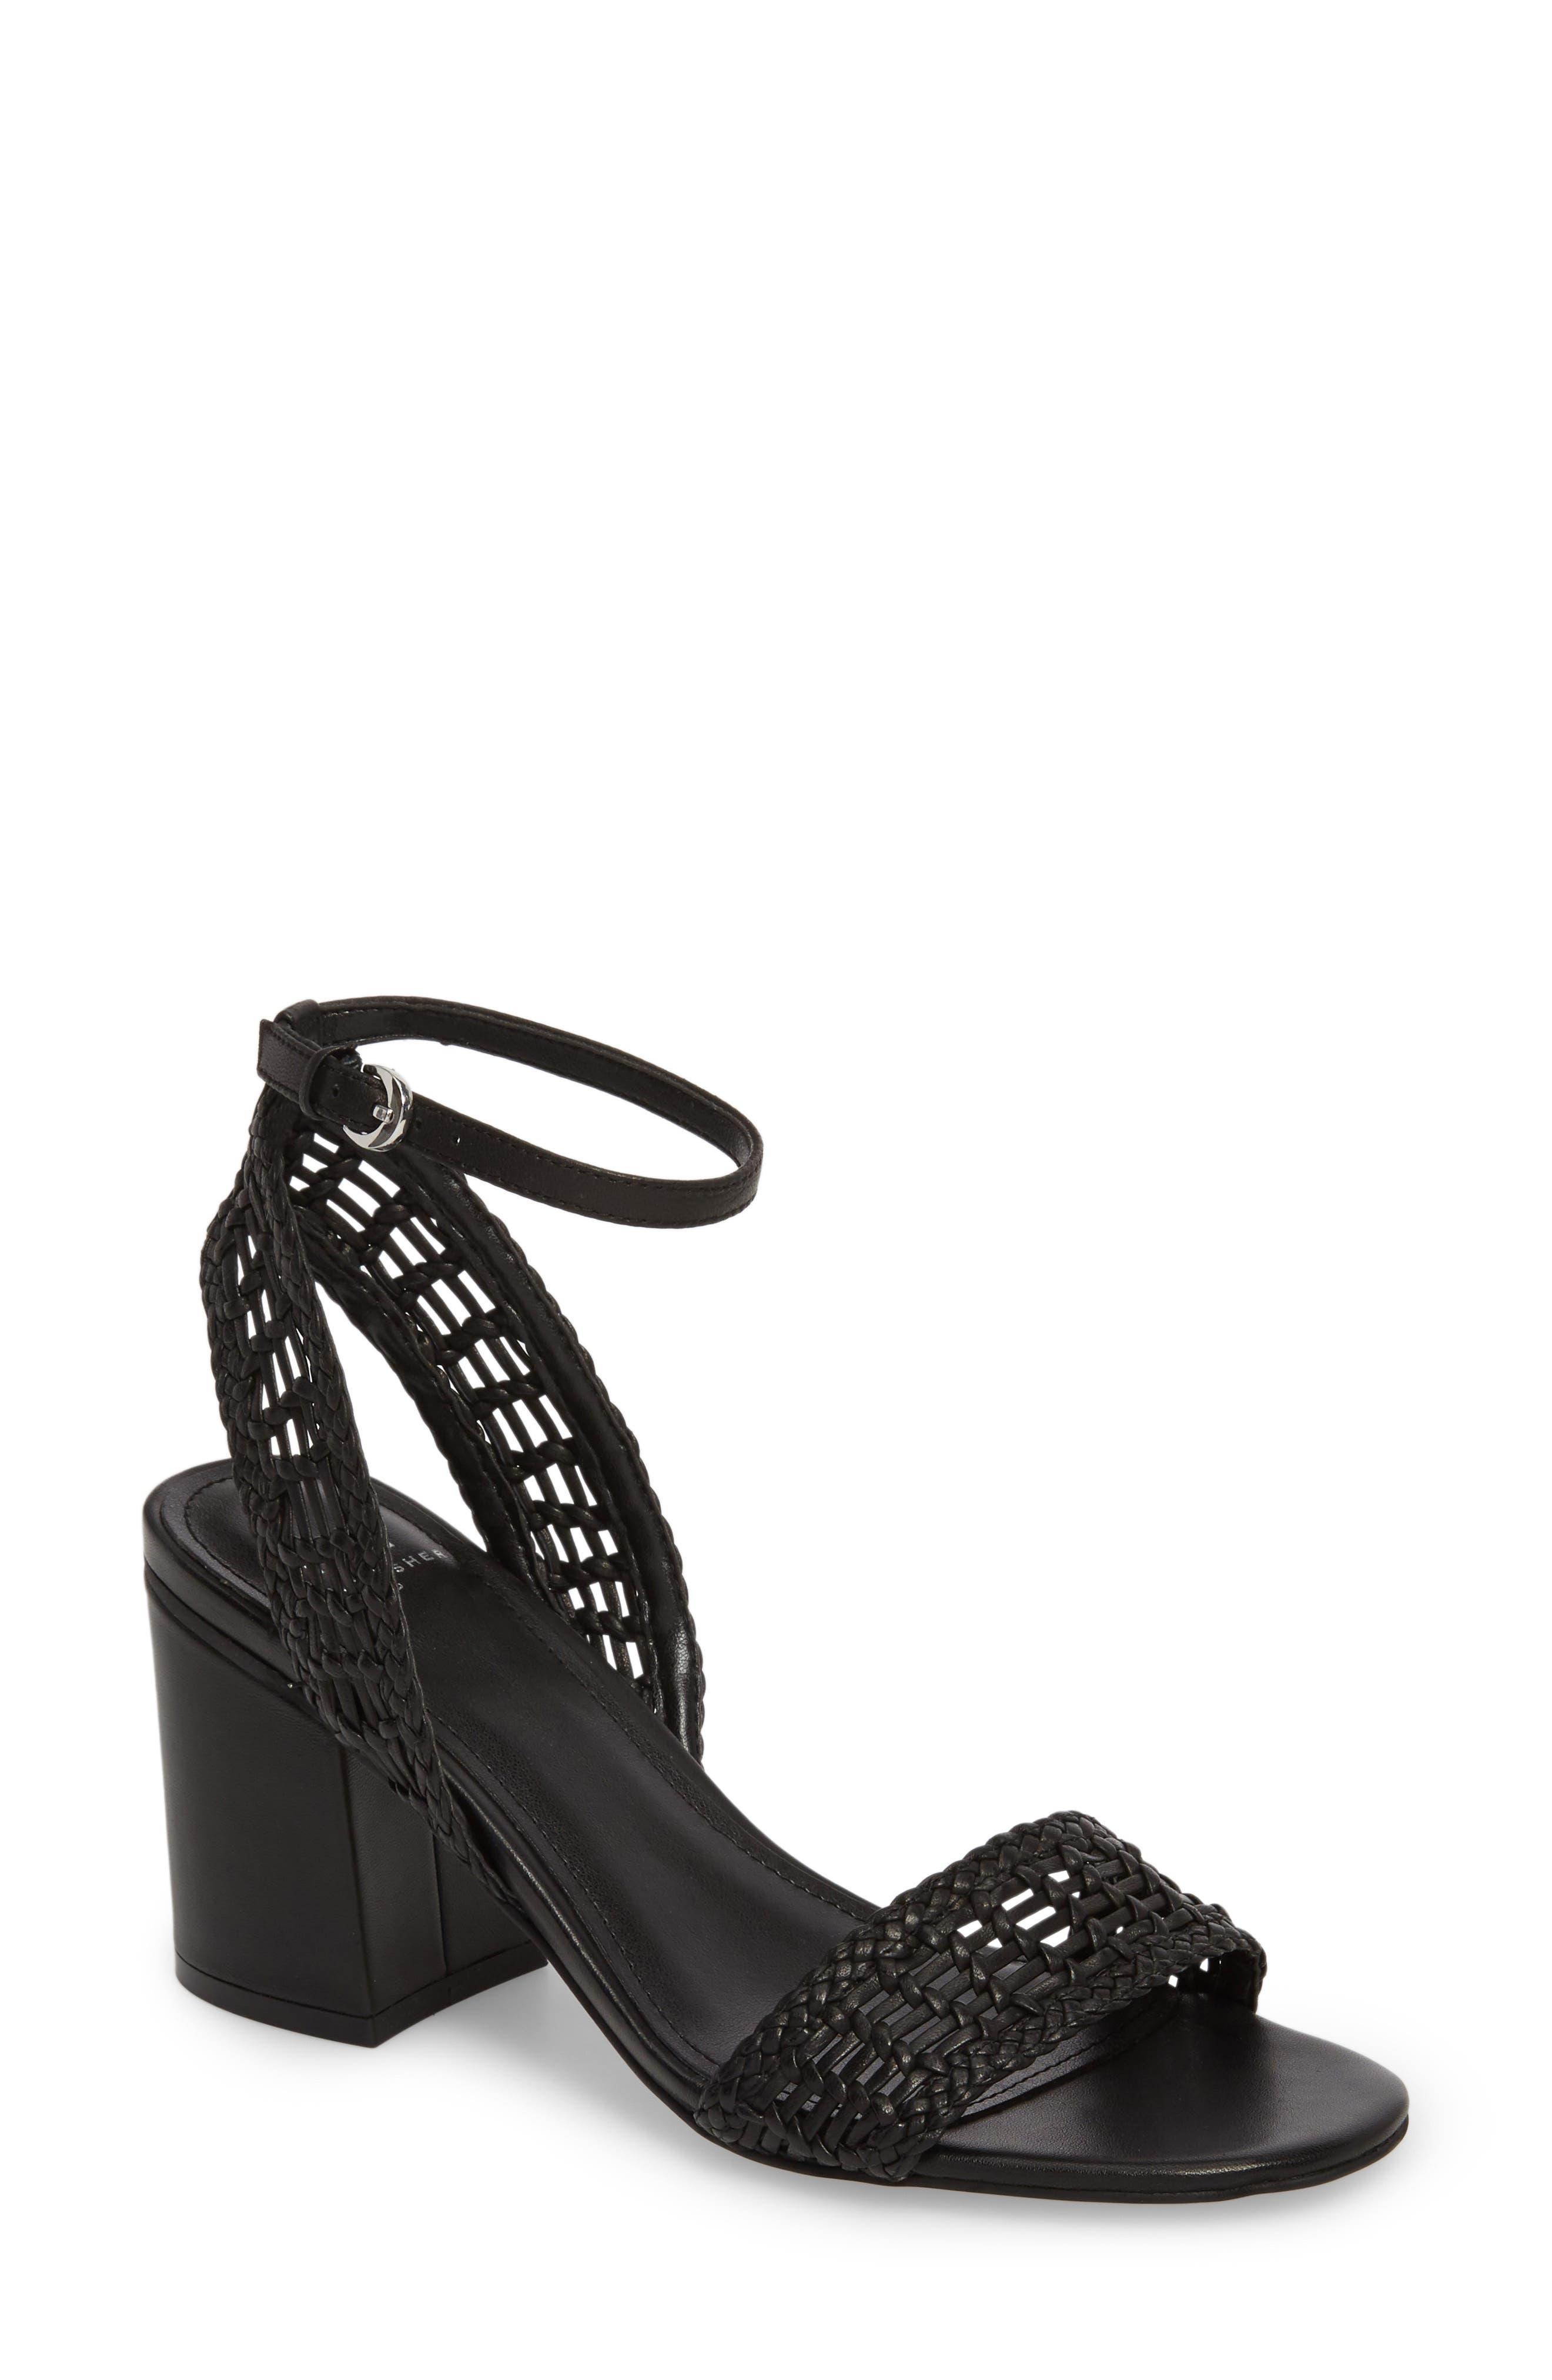 Amere Ankle Strap Sandal,                             Main thumbnail 1, color,                             Black Leather